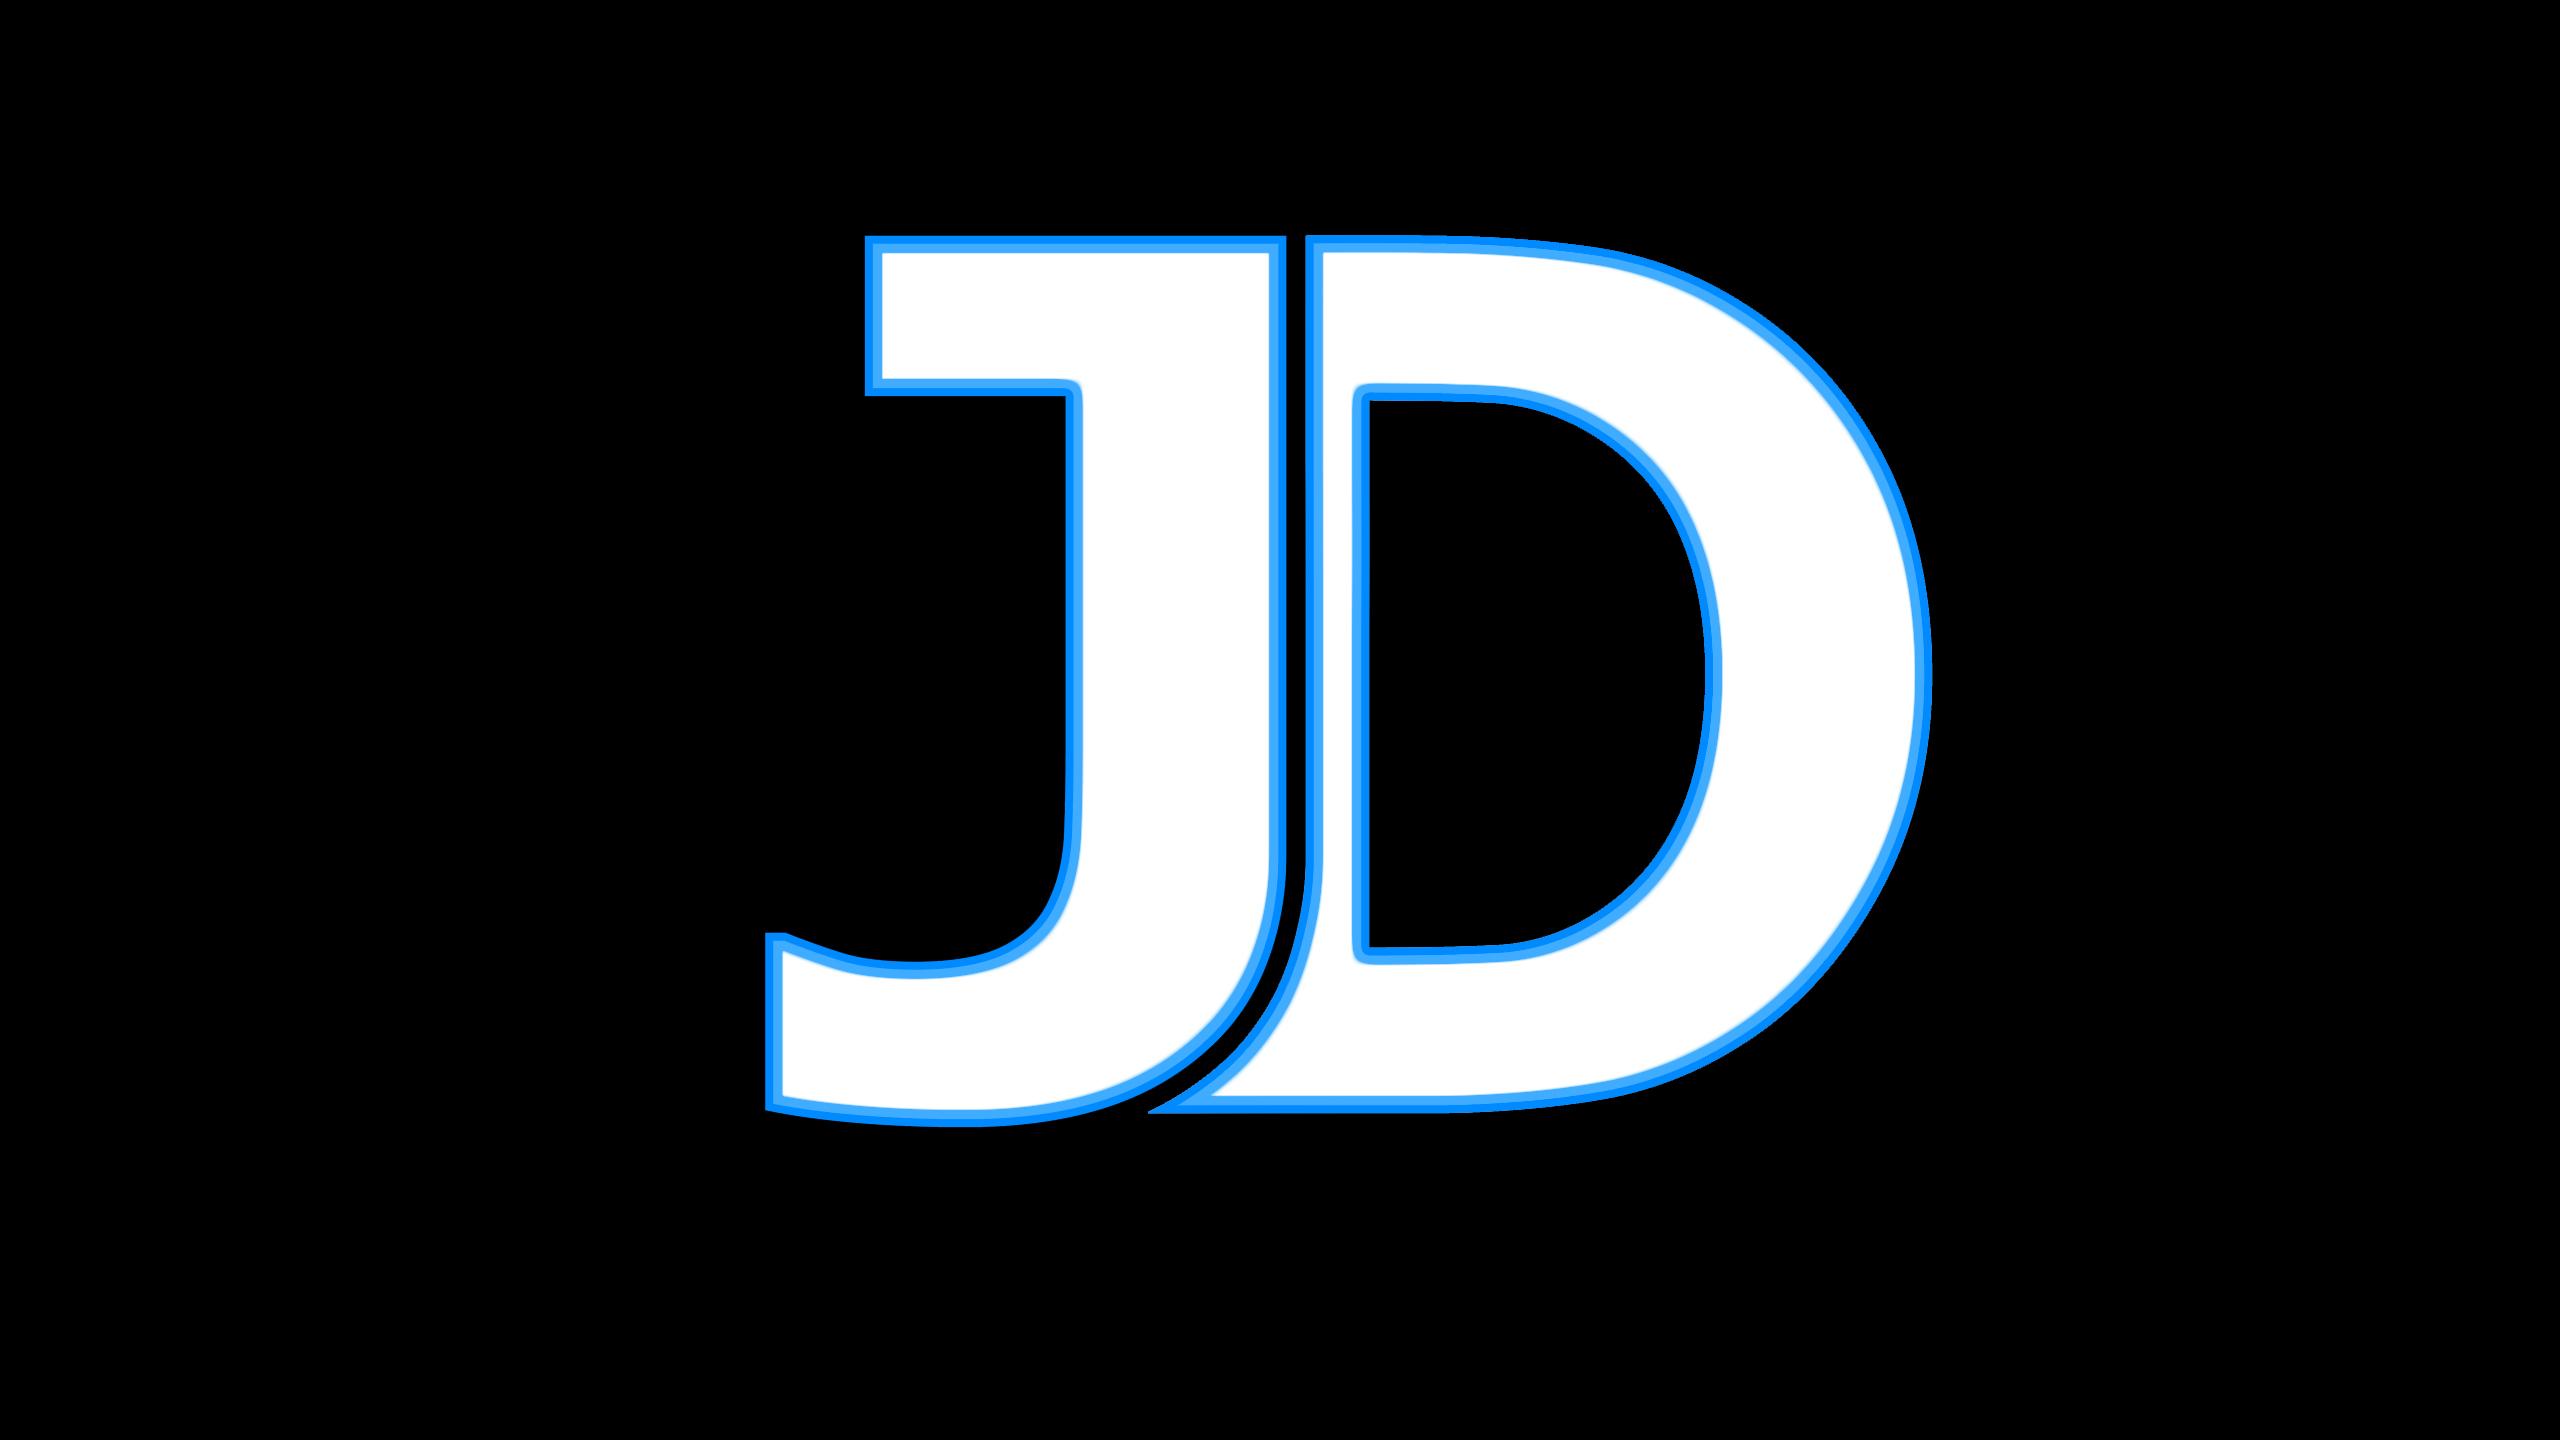 JD logo by JD1512 on DeviantArt